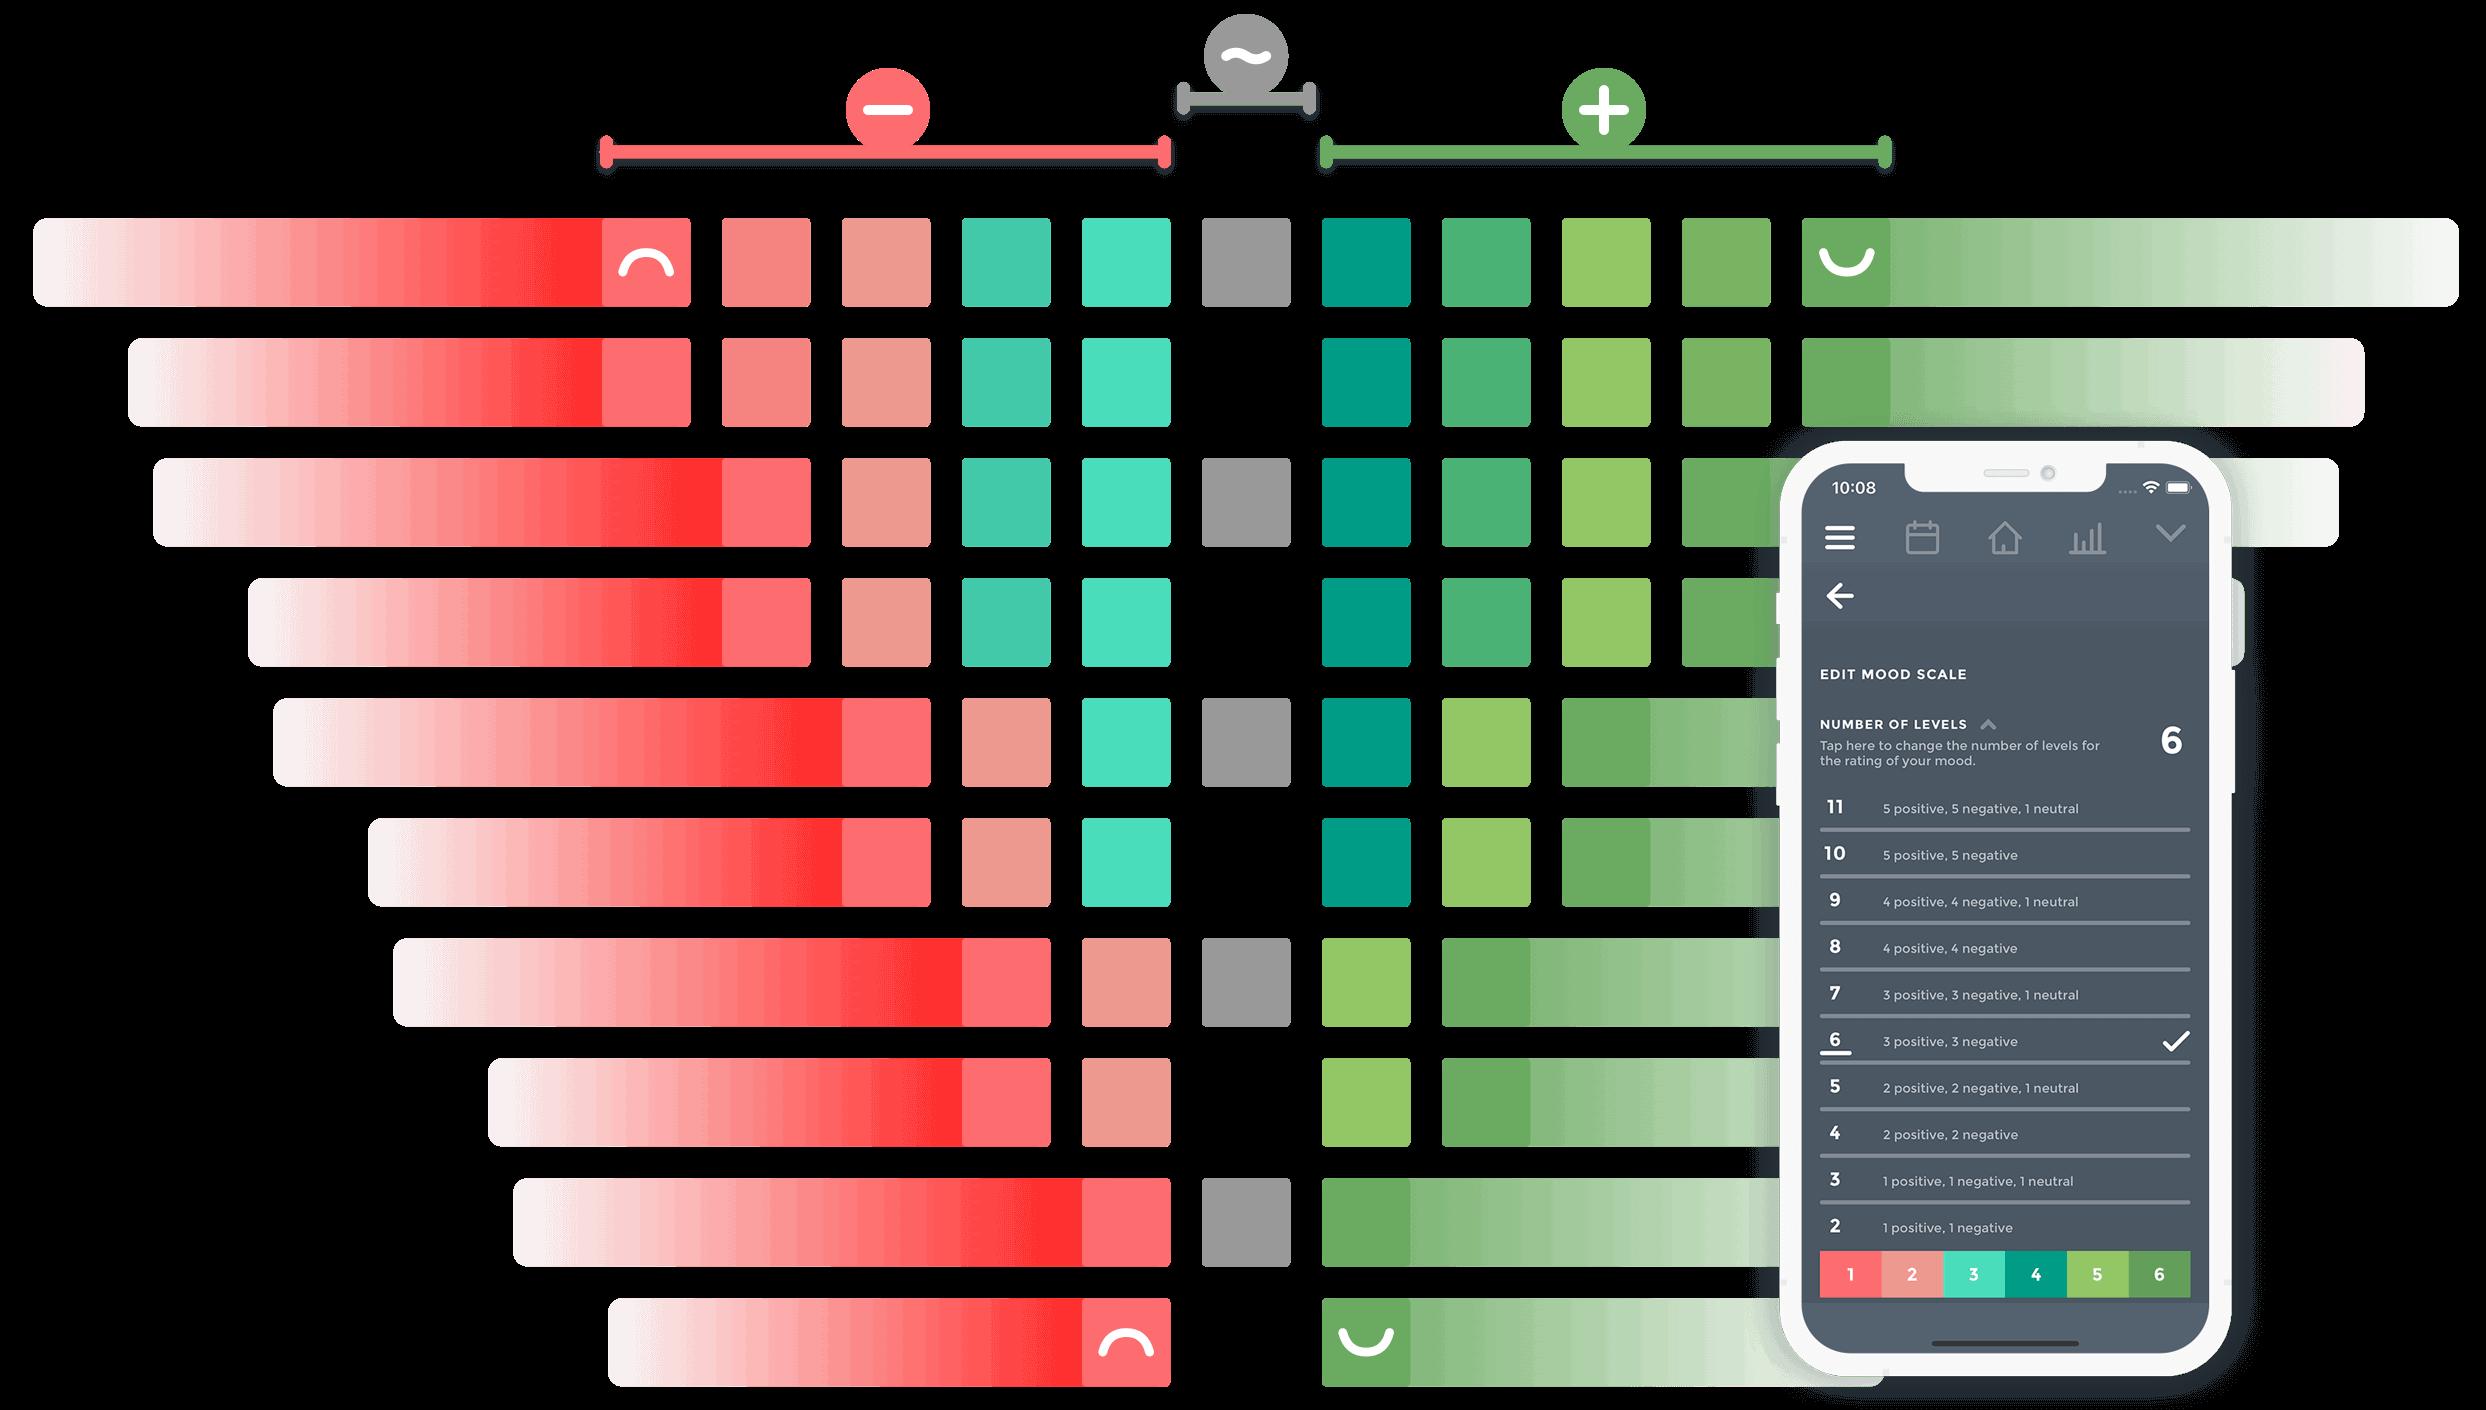 Mood Tracker App Moodistory - Edit mood scale